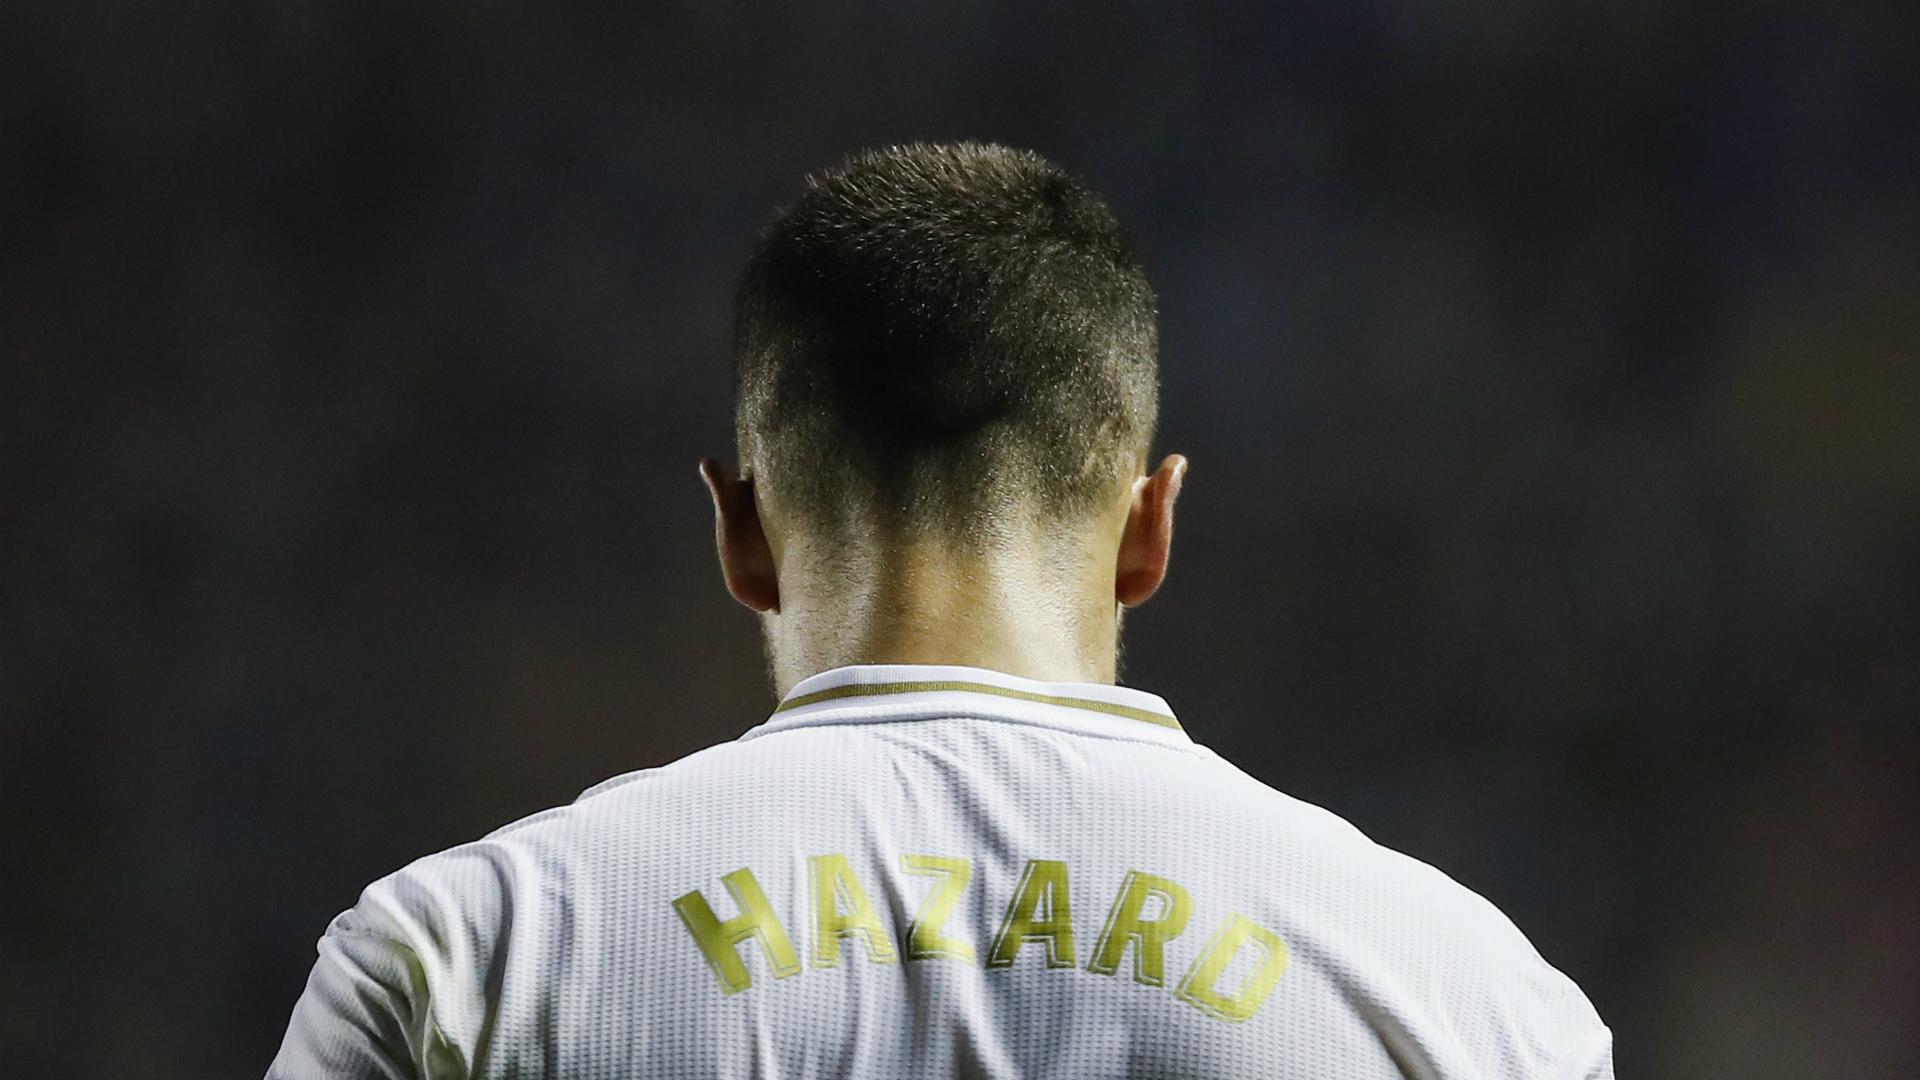 Capello: Madrid shirt burden affected Hazard, but he can dazzle next season